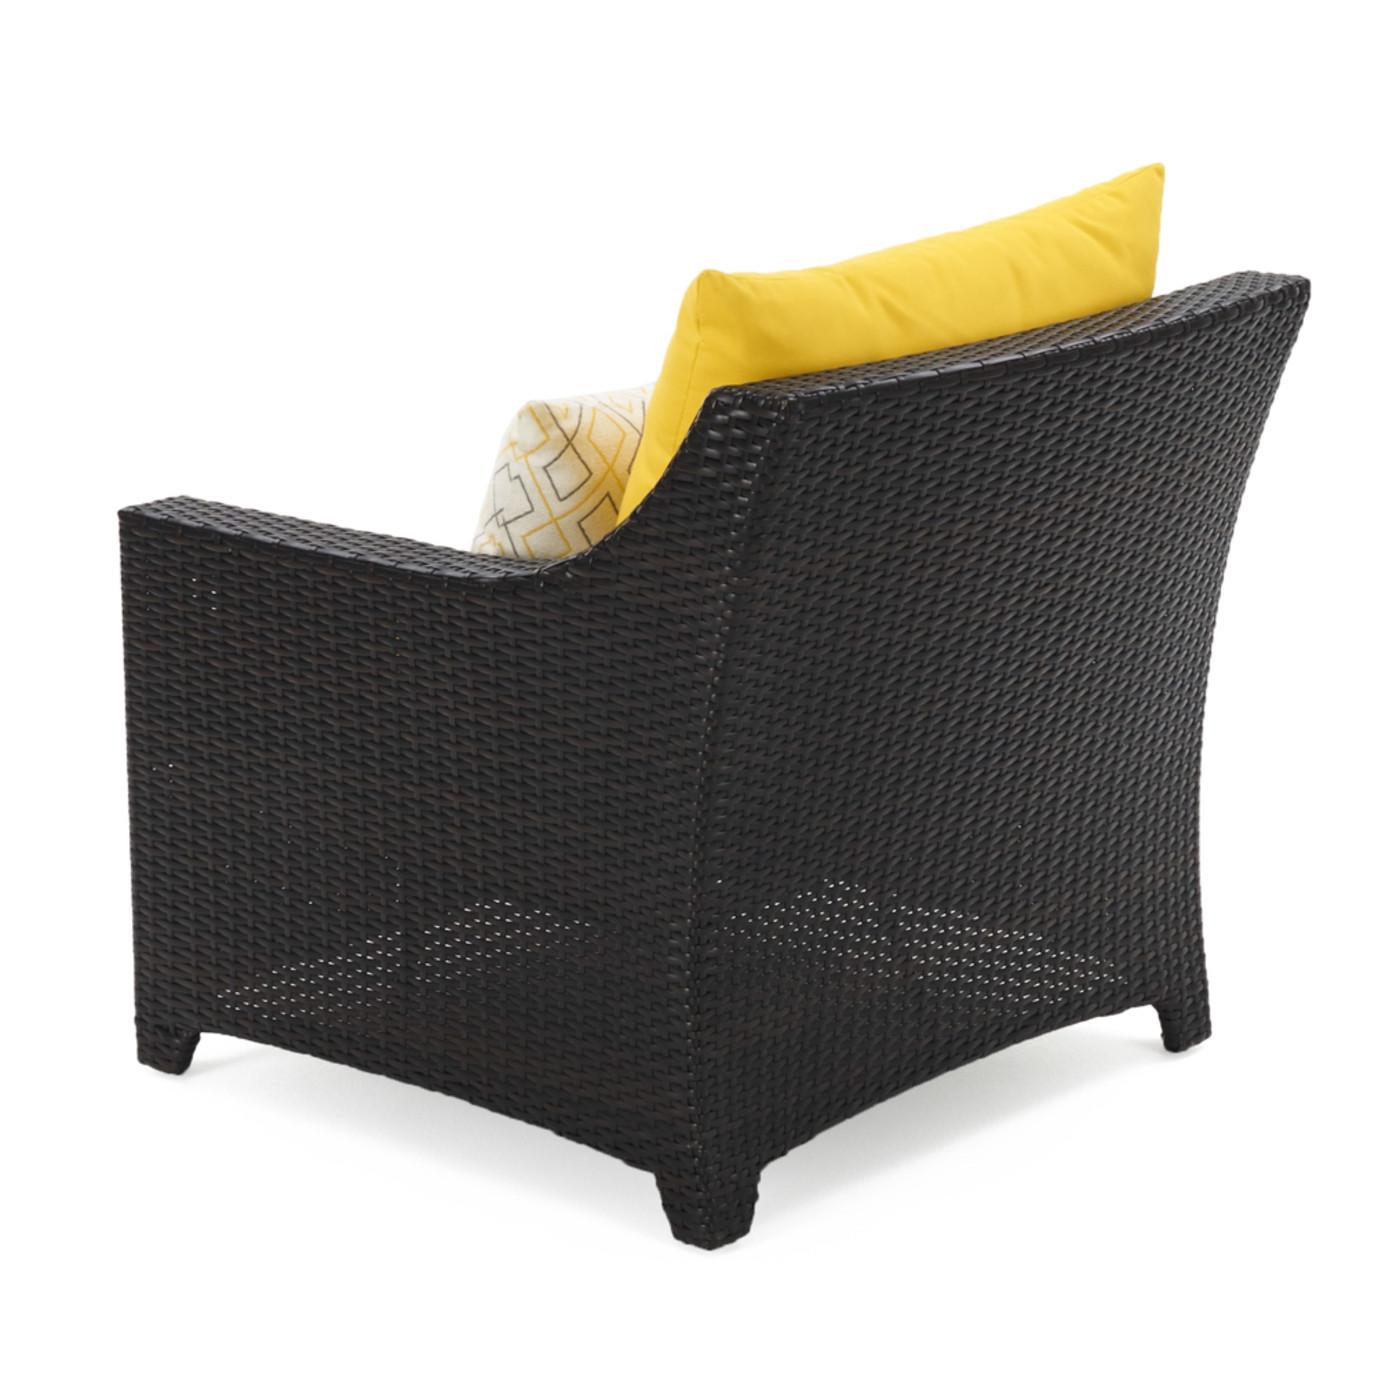 Deco™ Club Chairs - Sunflower Yellow